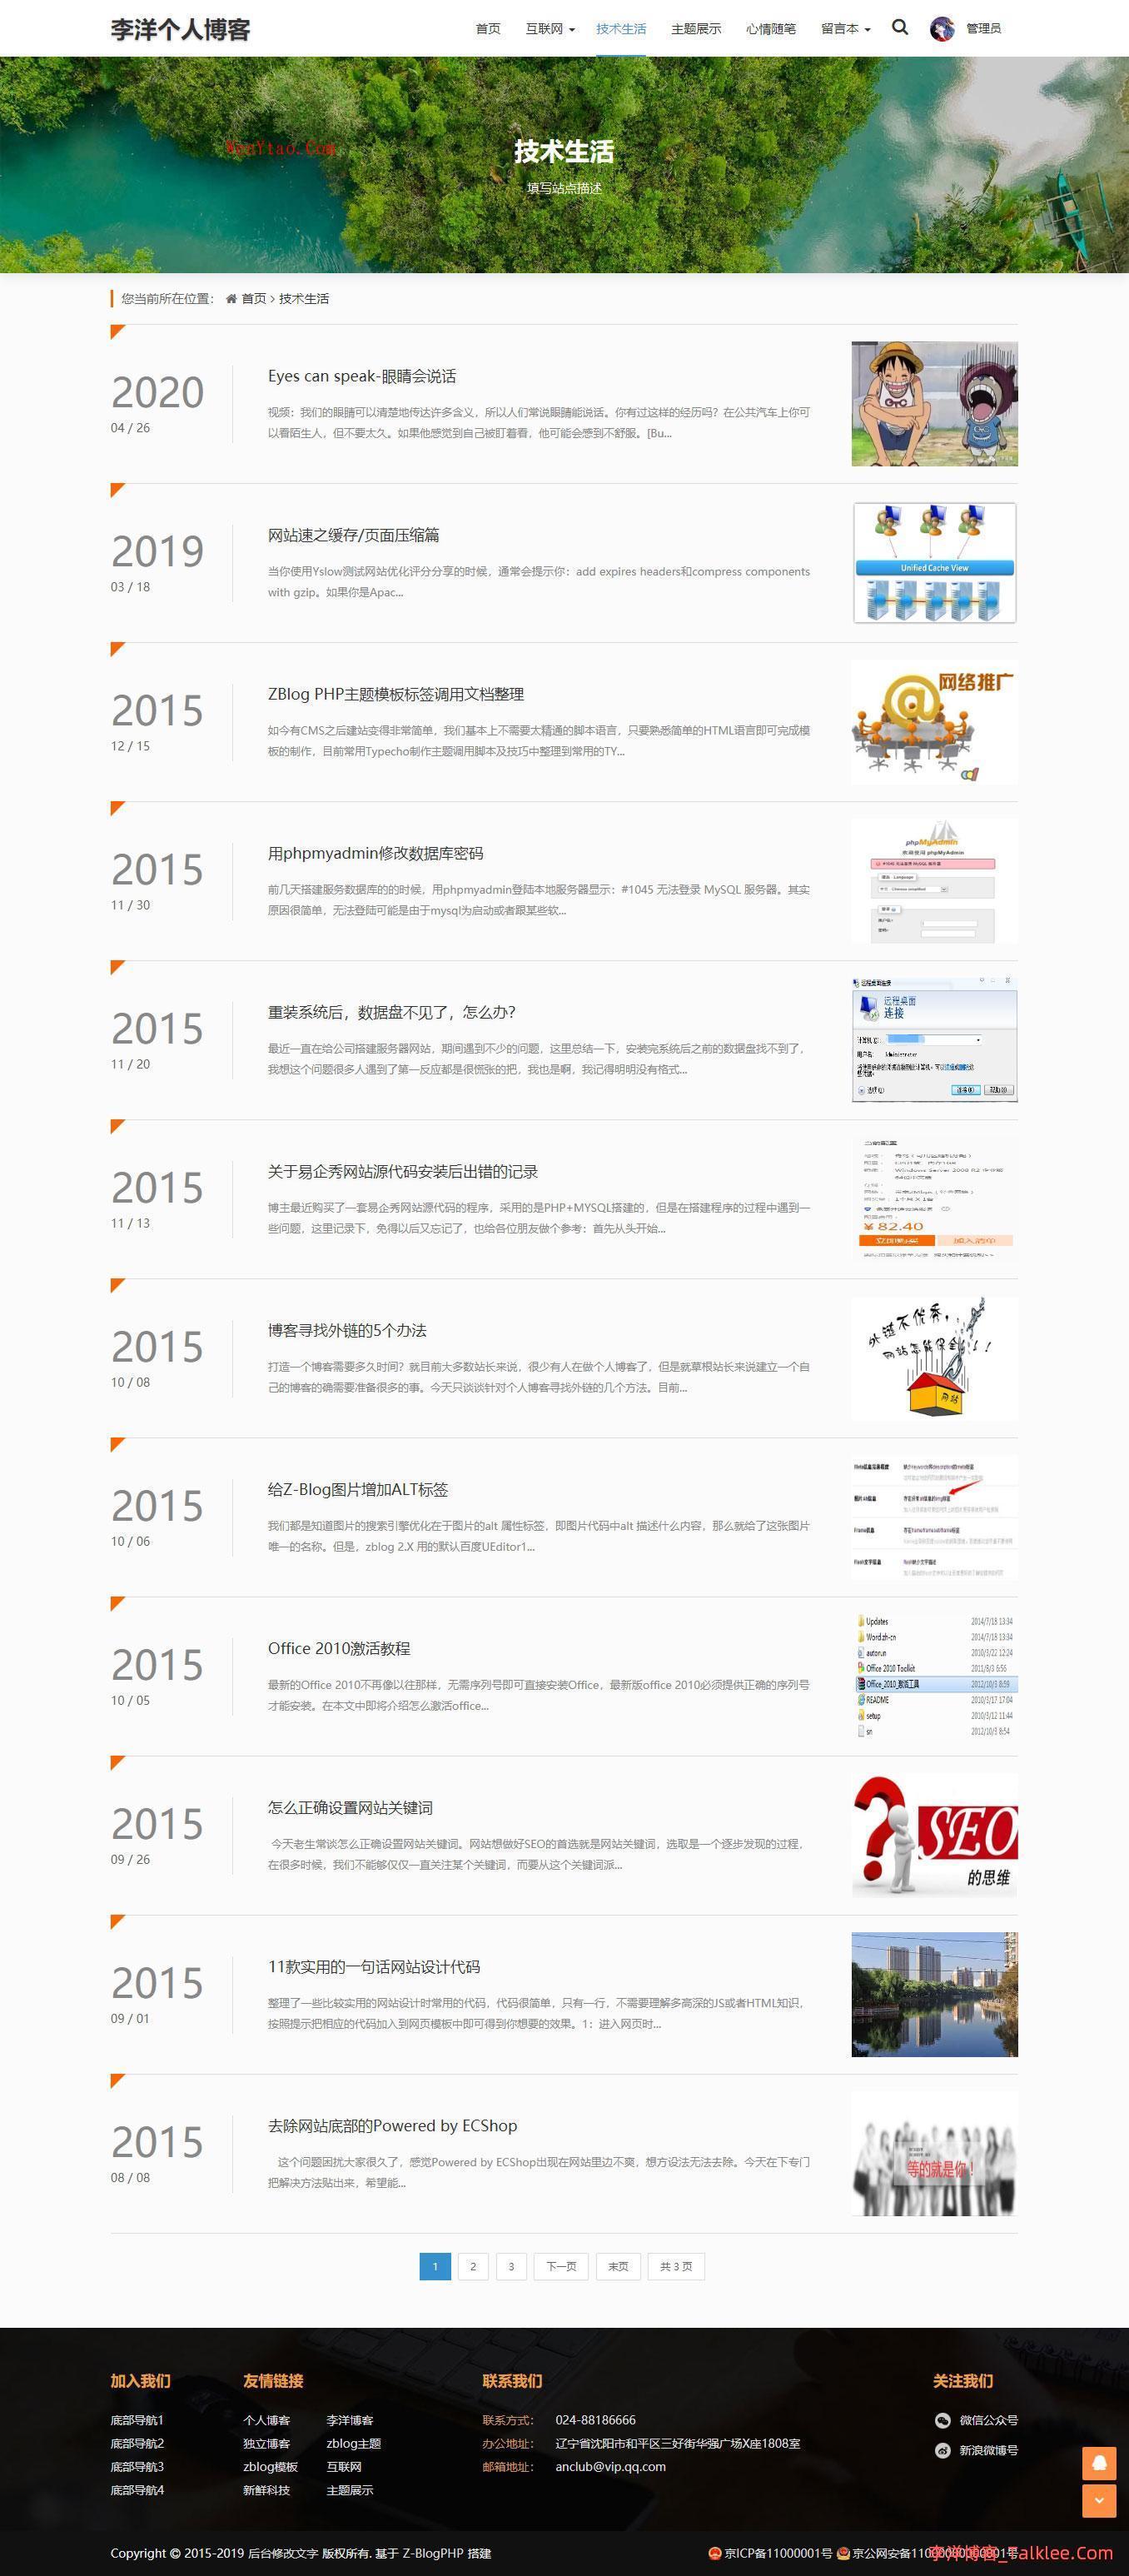 zblog企业展示型主题模板赢天下(Winlee)助力小微企业成长,zblog企业展示型主题模板赢天下(Winlee)助力小微企业成长 第4张,第4张